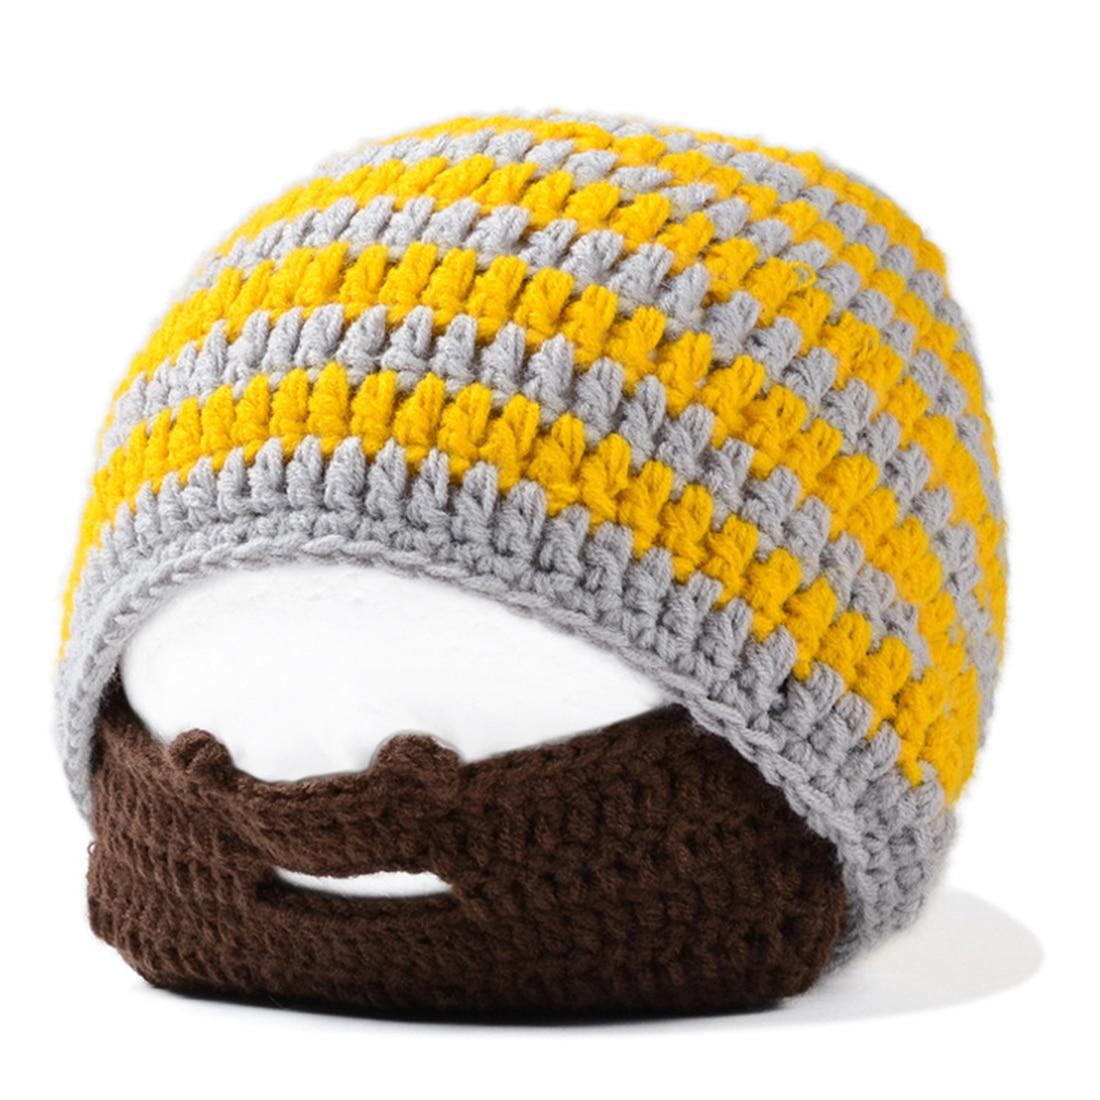 eca4a78ad9c07 MYPF-Handmade Knitted Crochet Beard Hat Bicycle Mask Ski Cap roman knight  octopus Cool Funny